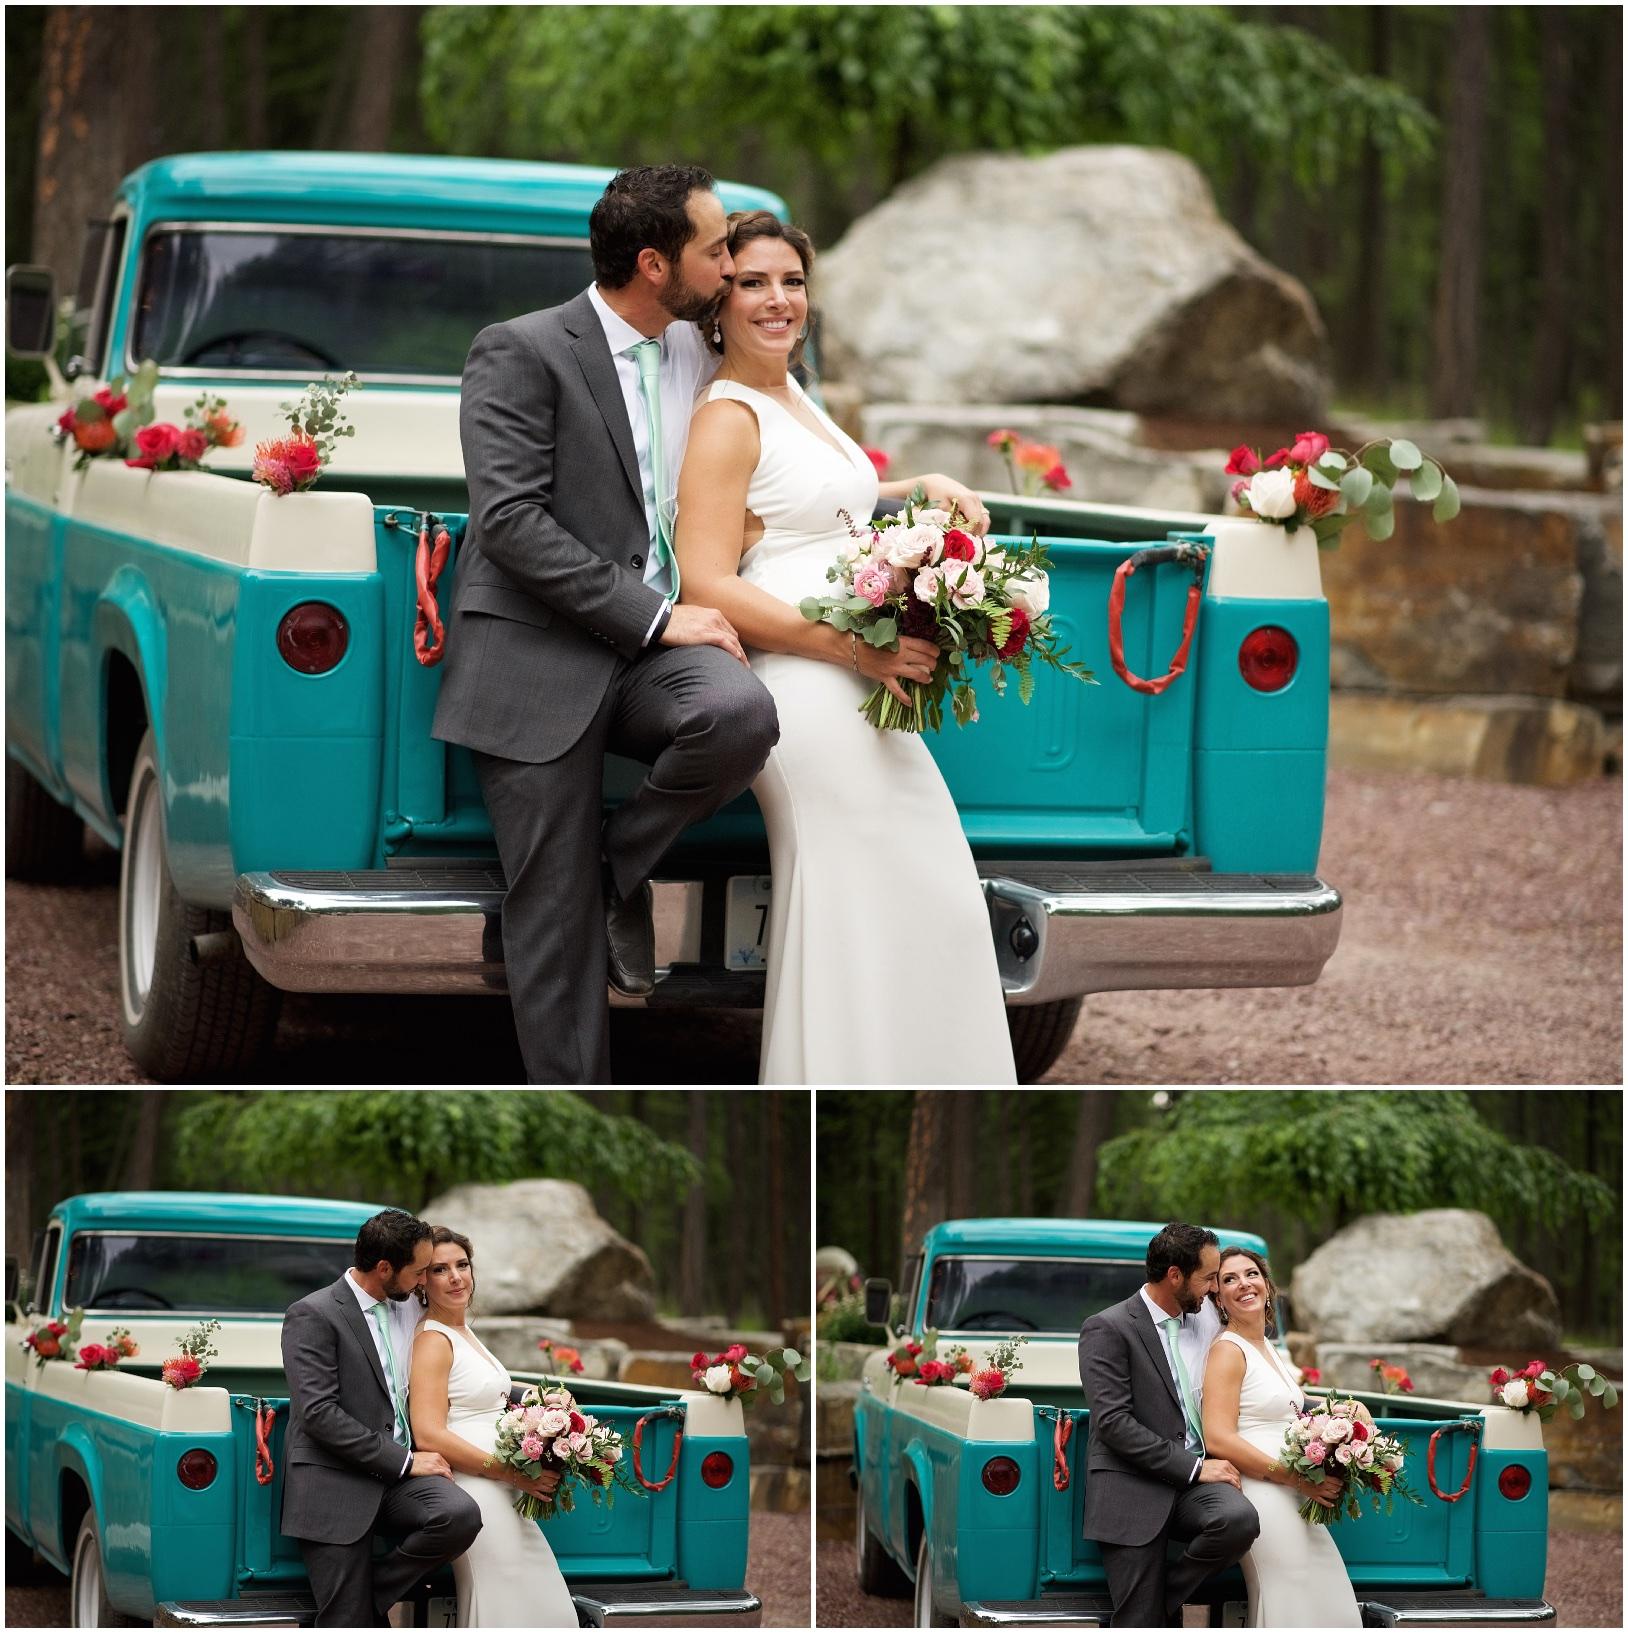 lindseyjane_wedding093.jpg